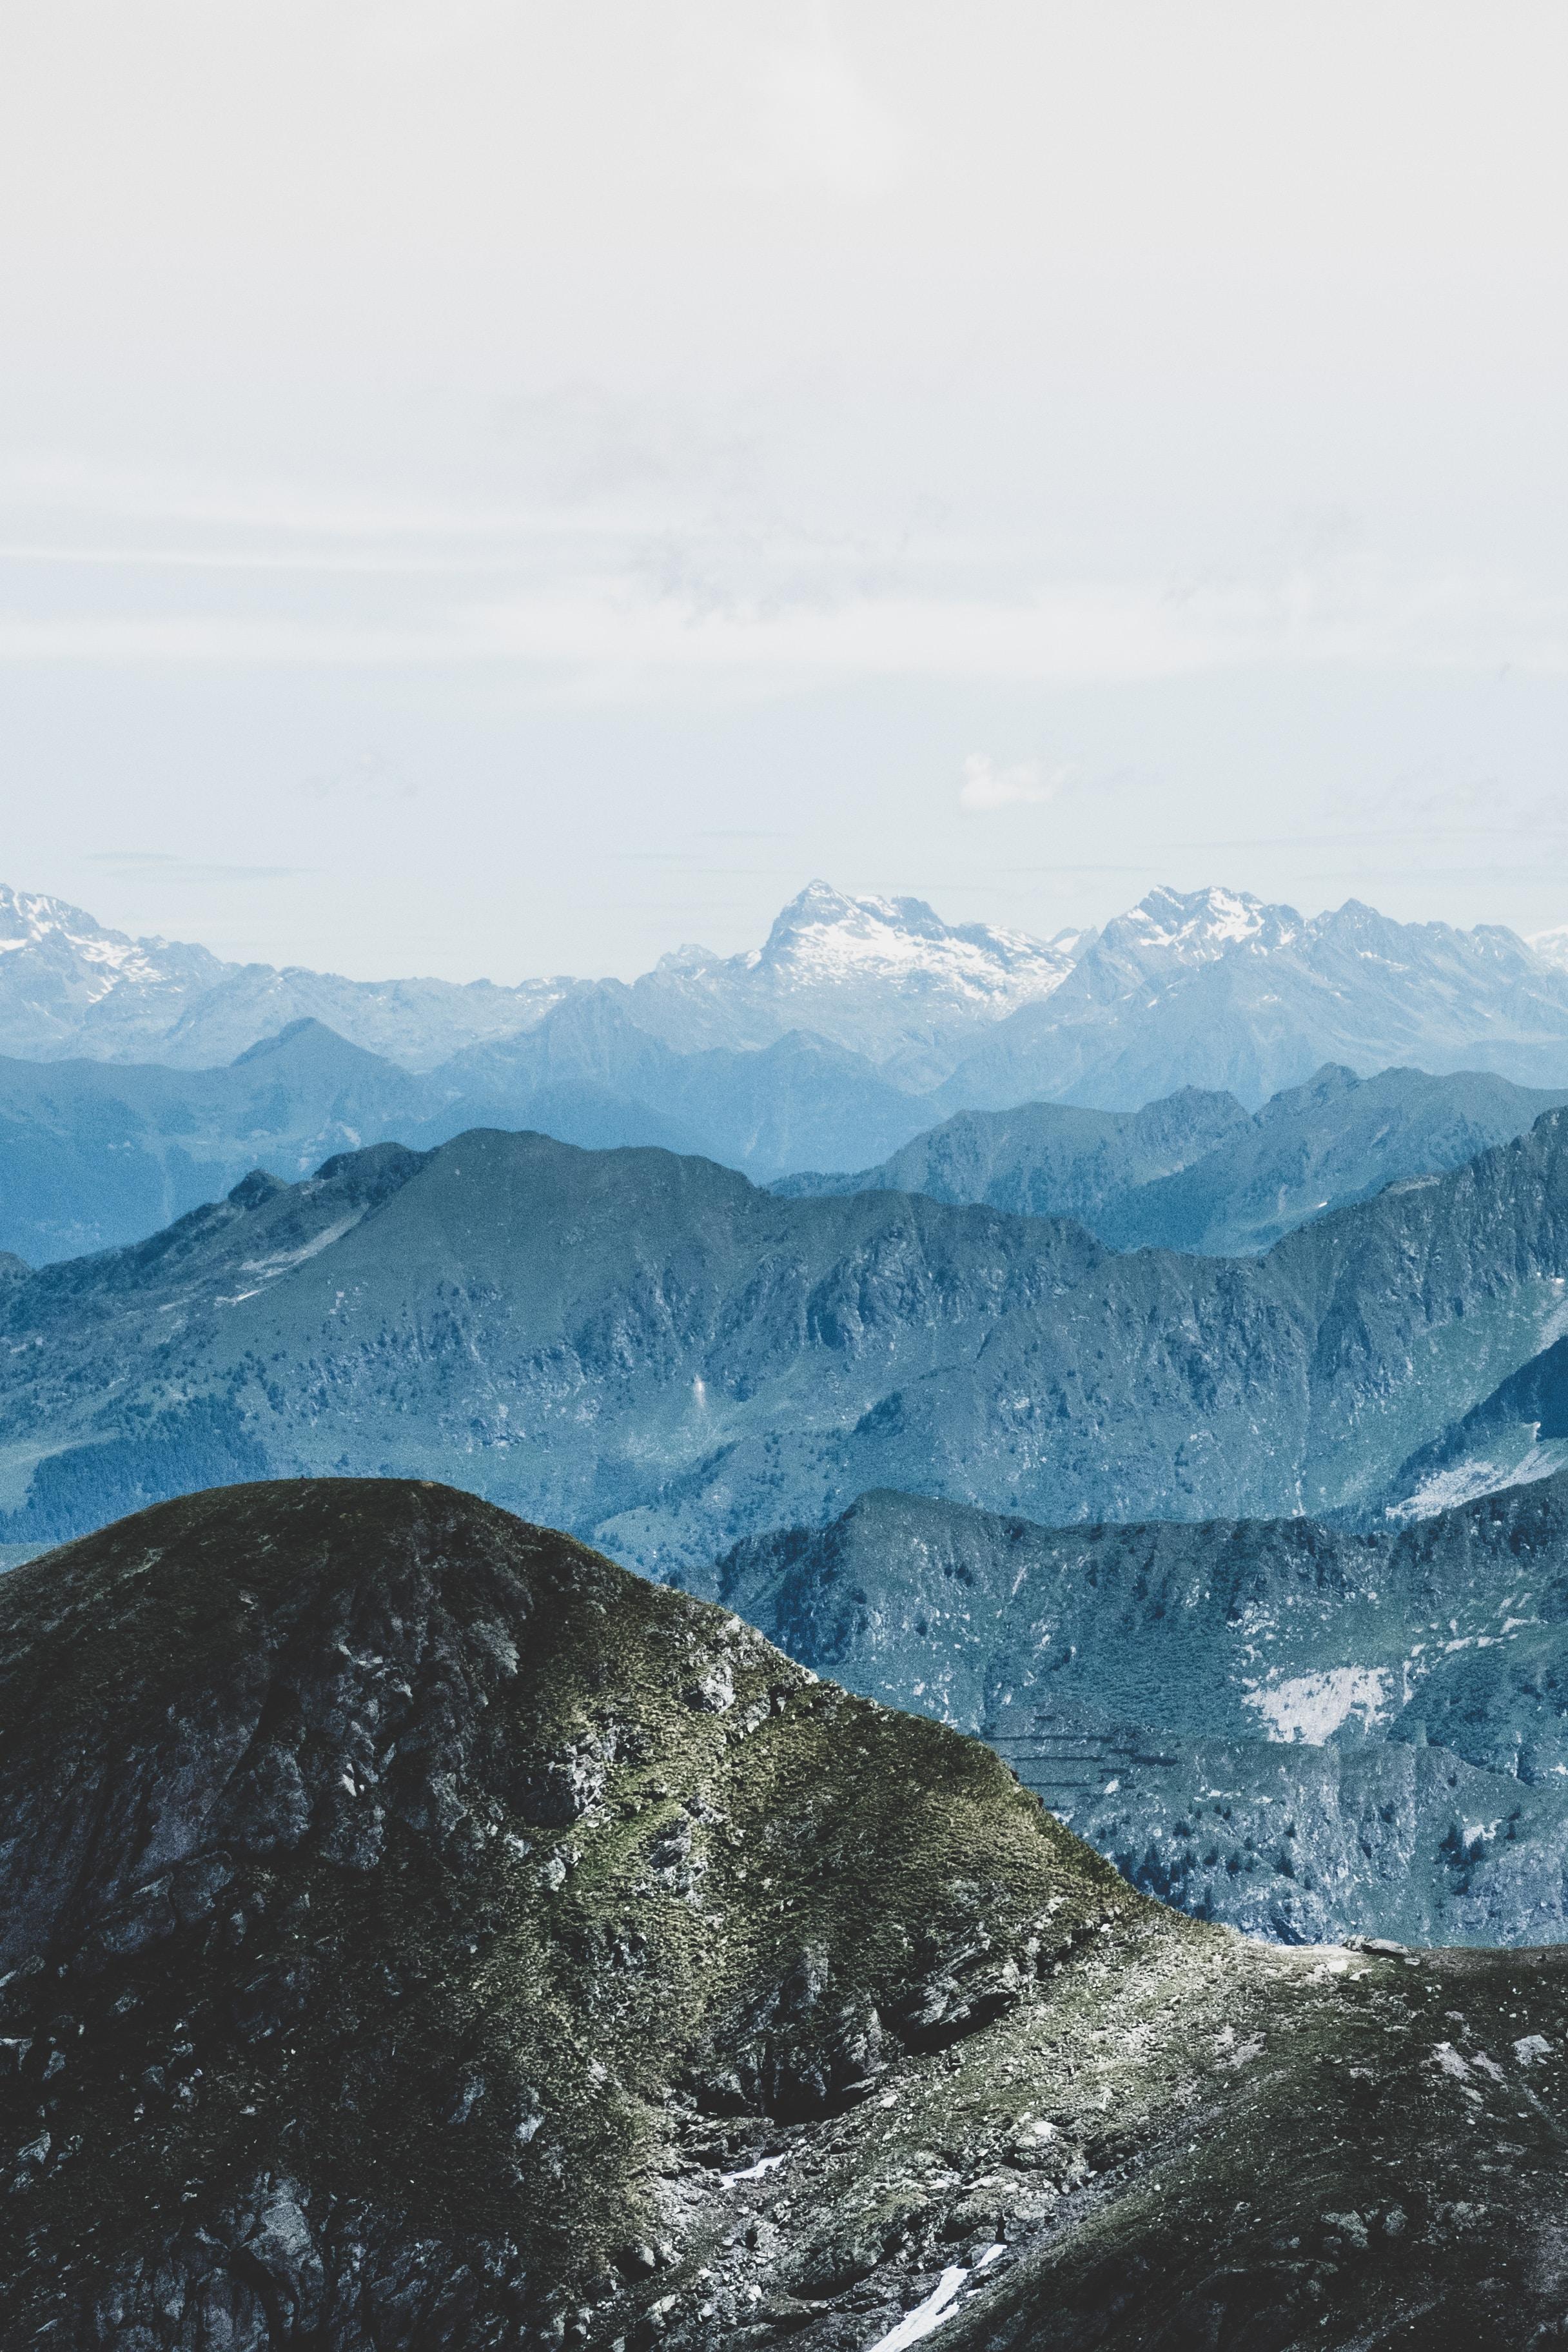 Fault-Block mountain under clouds